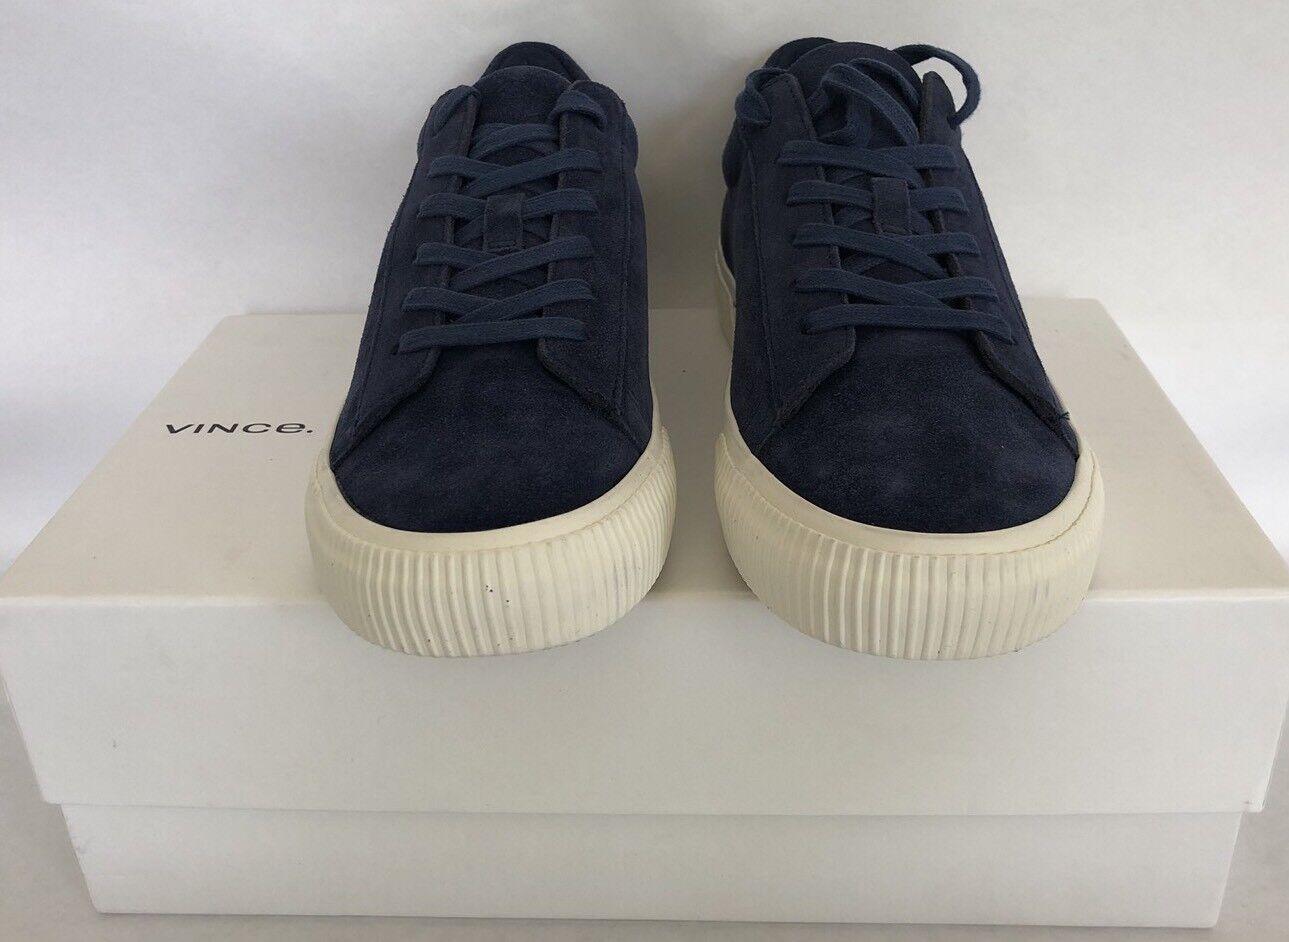 Men's Vince Suede Kurtis Sneaker in Ocean Size 7.5 - NWB